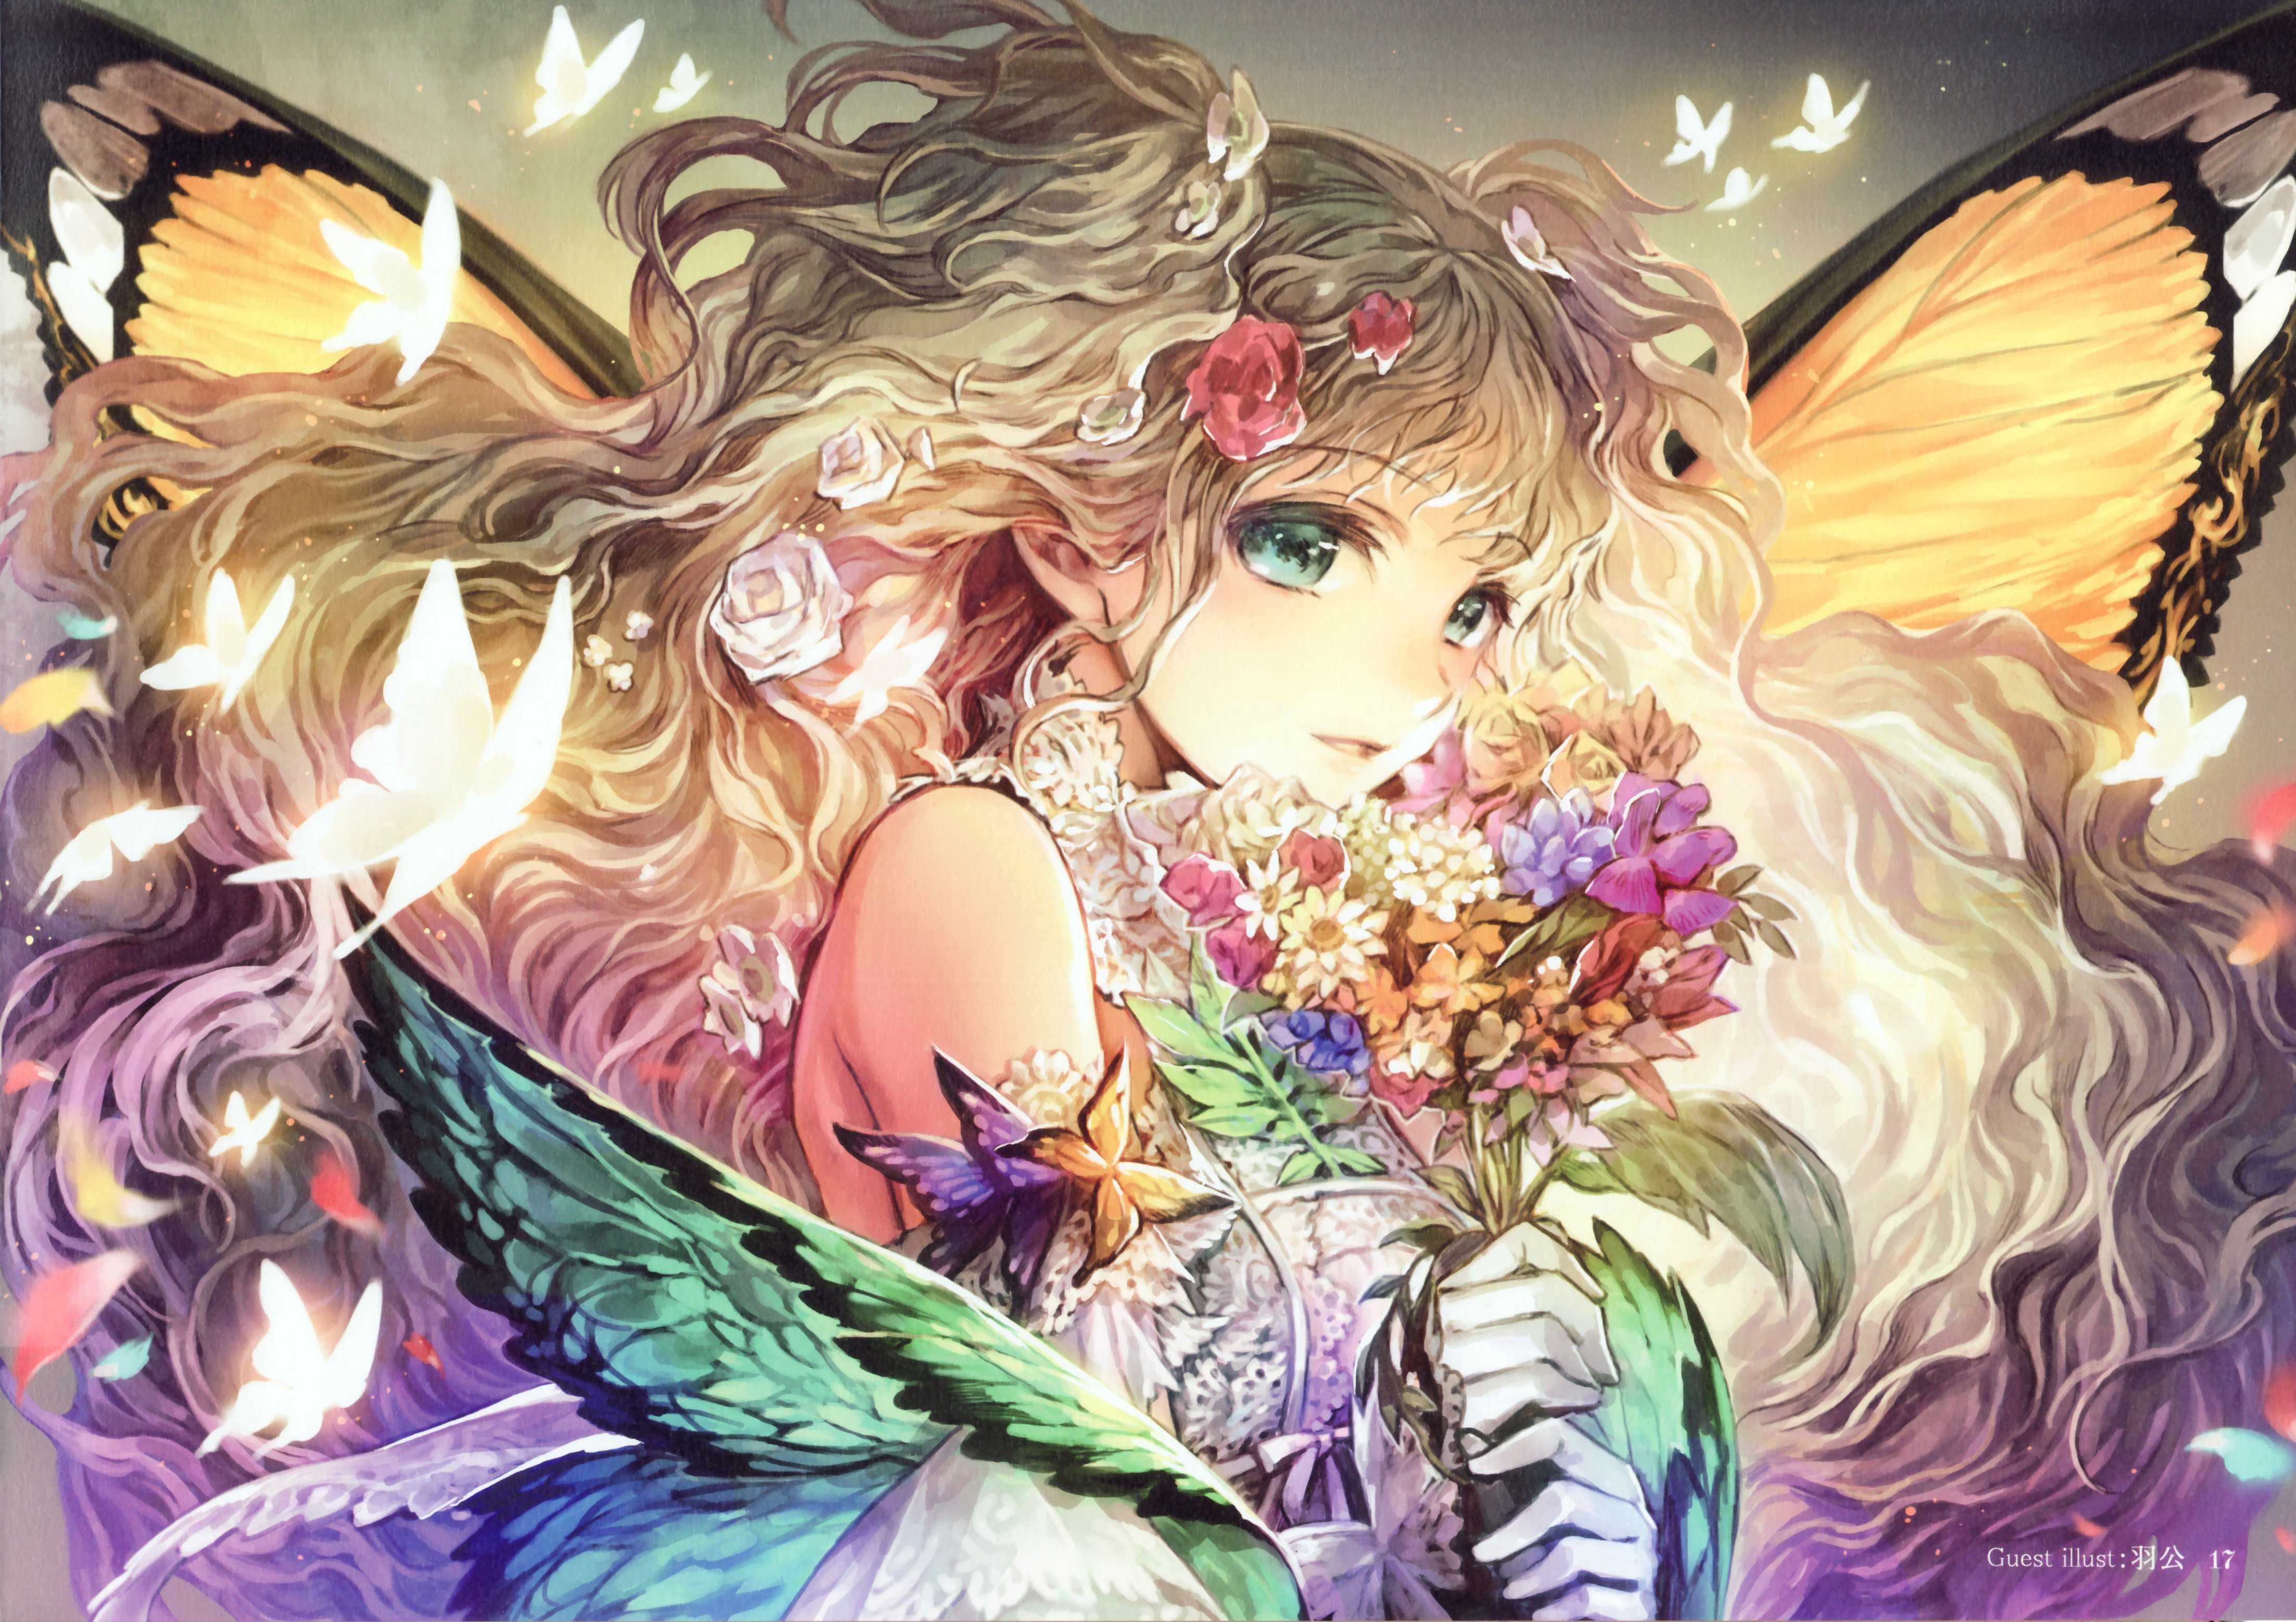 Download Wallpaper 3840x2400 Anime, Boy, Girl, Flowers, Wreath ...